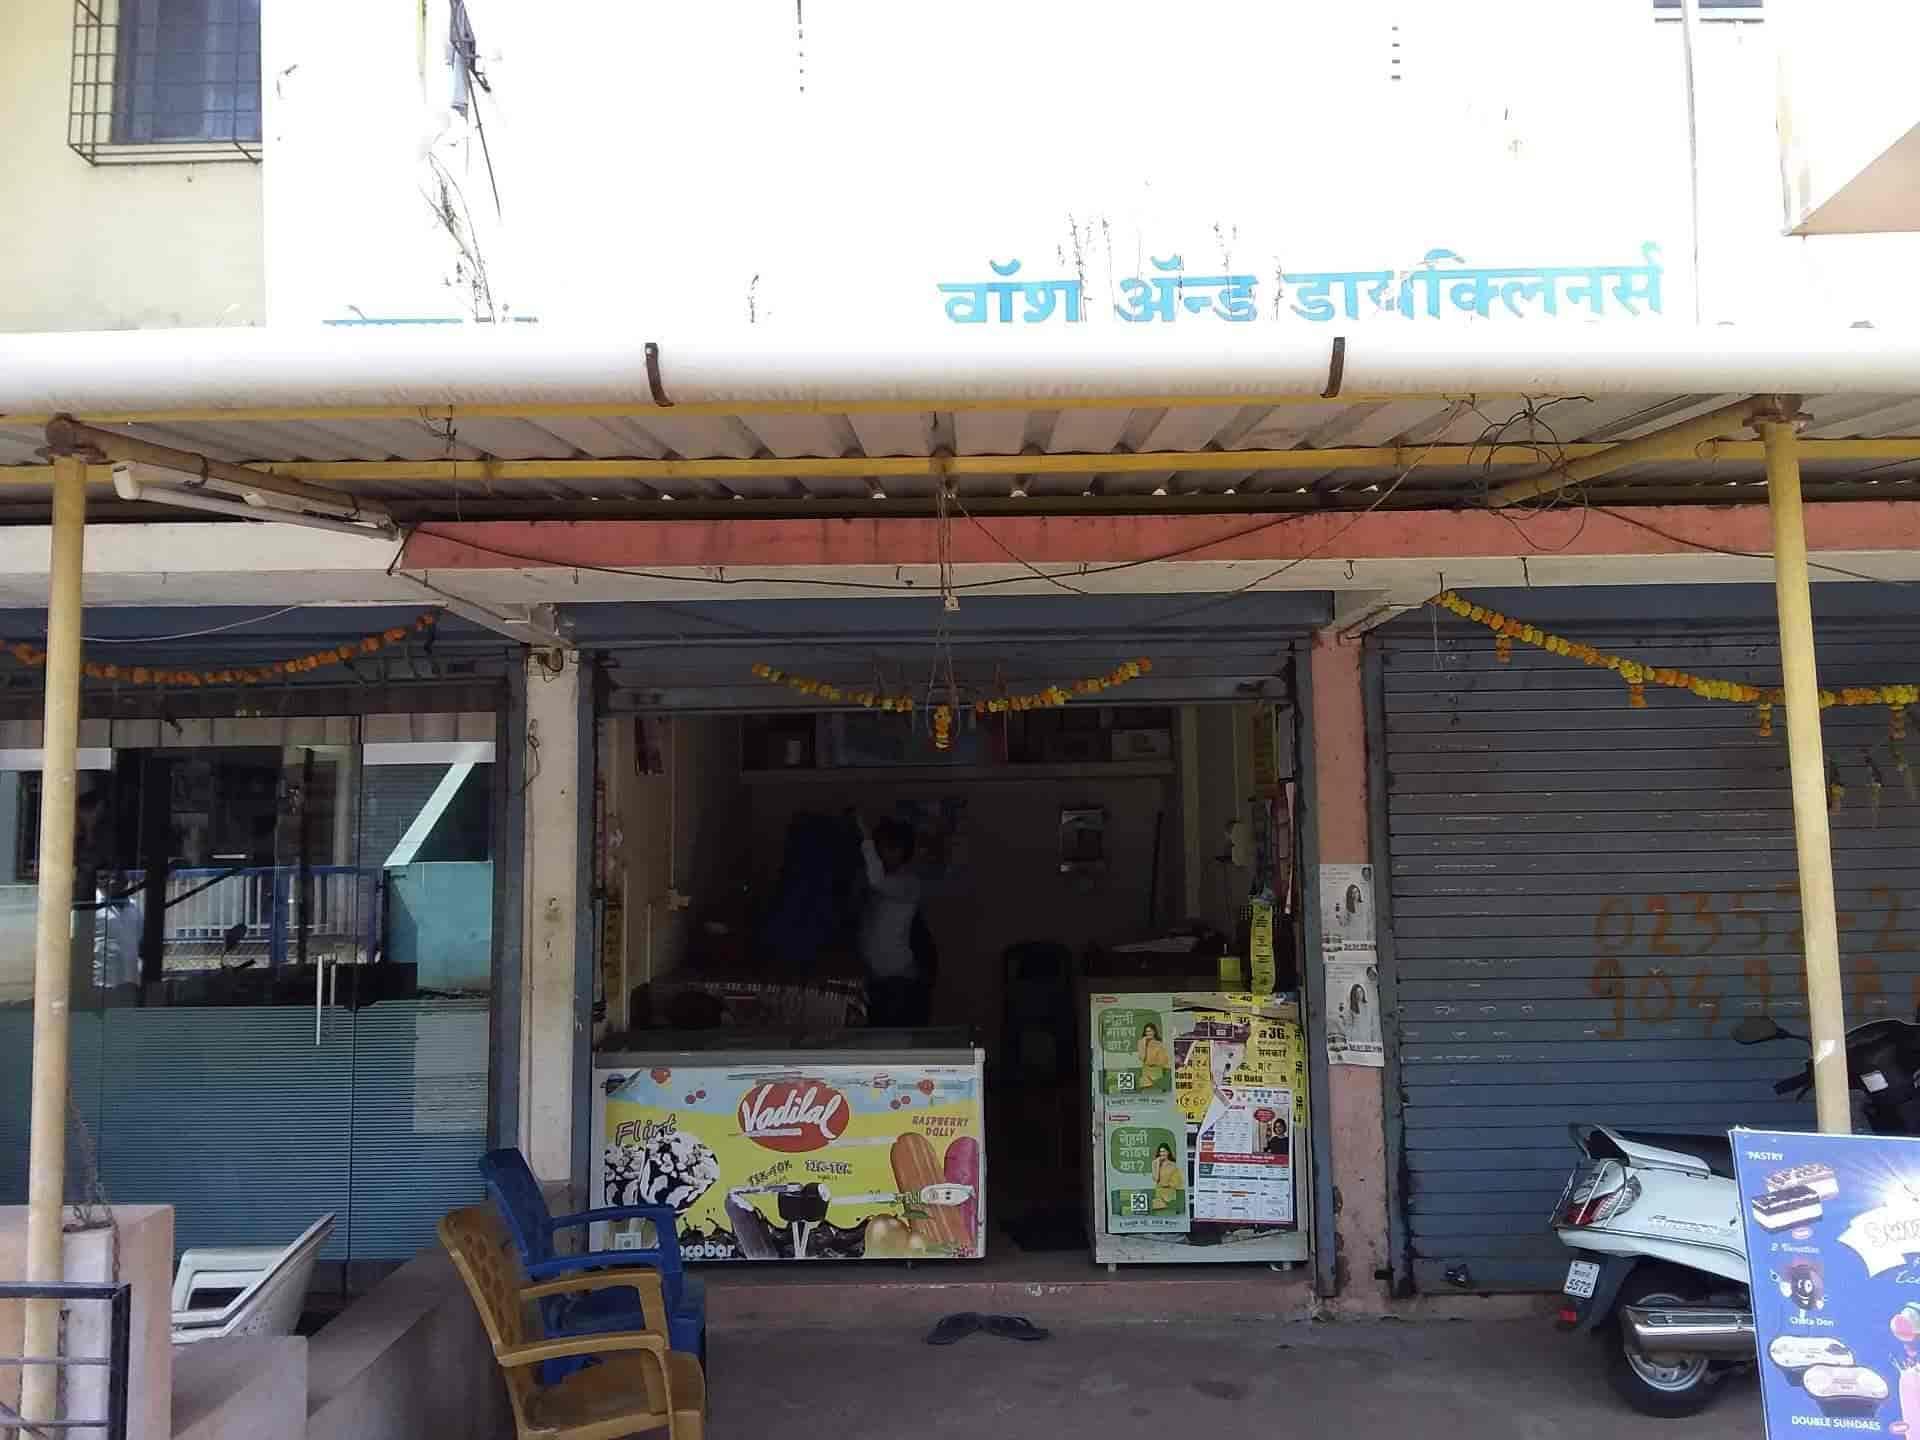 Mangalmurti Loundry Photos, Ratnagiri MIDC, Ratnagiri- Pictures